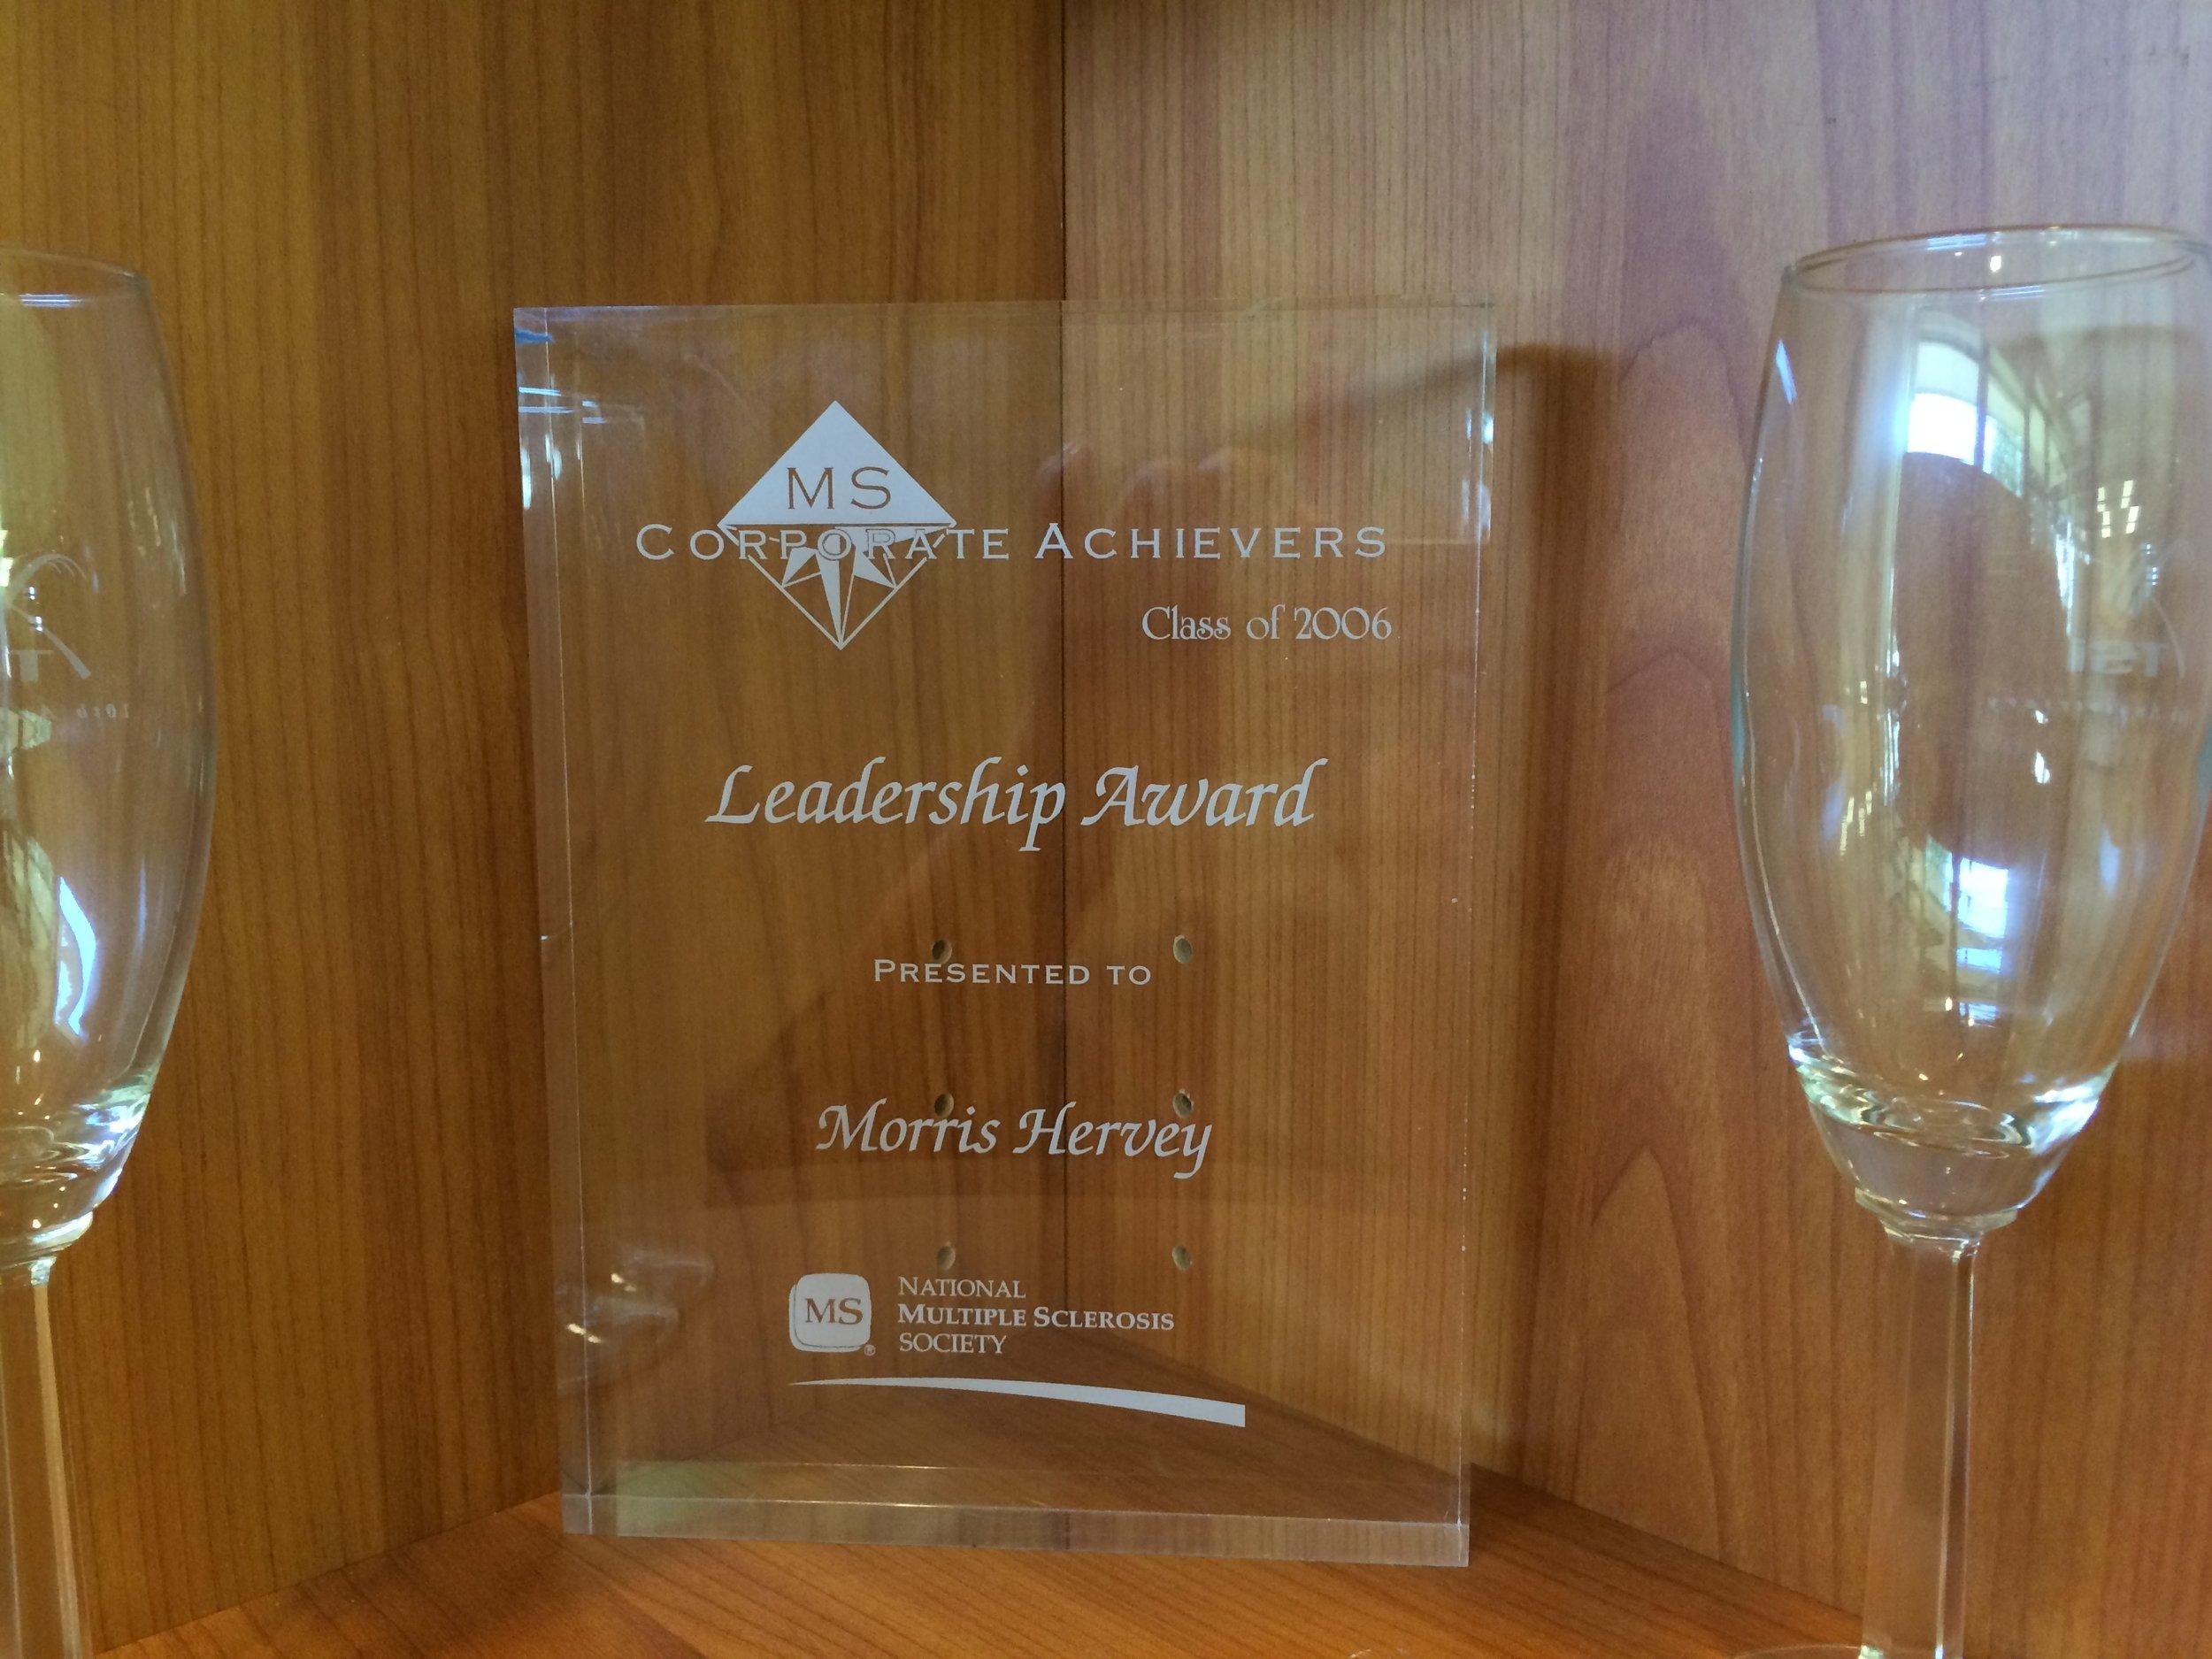 MS Corporate Achievers Leadership Award